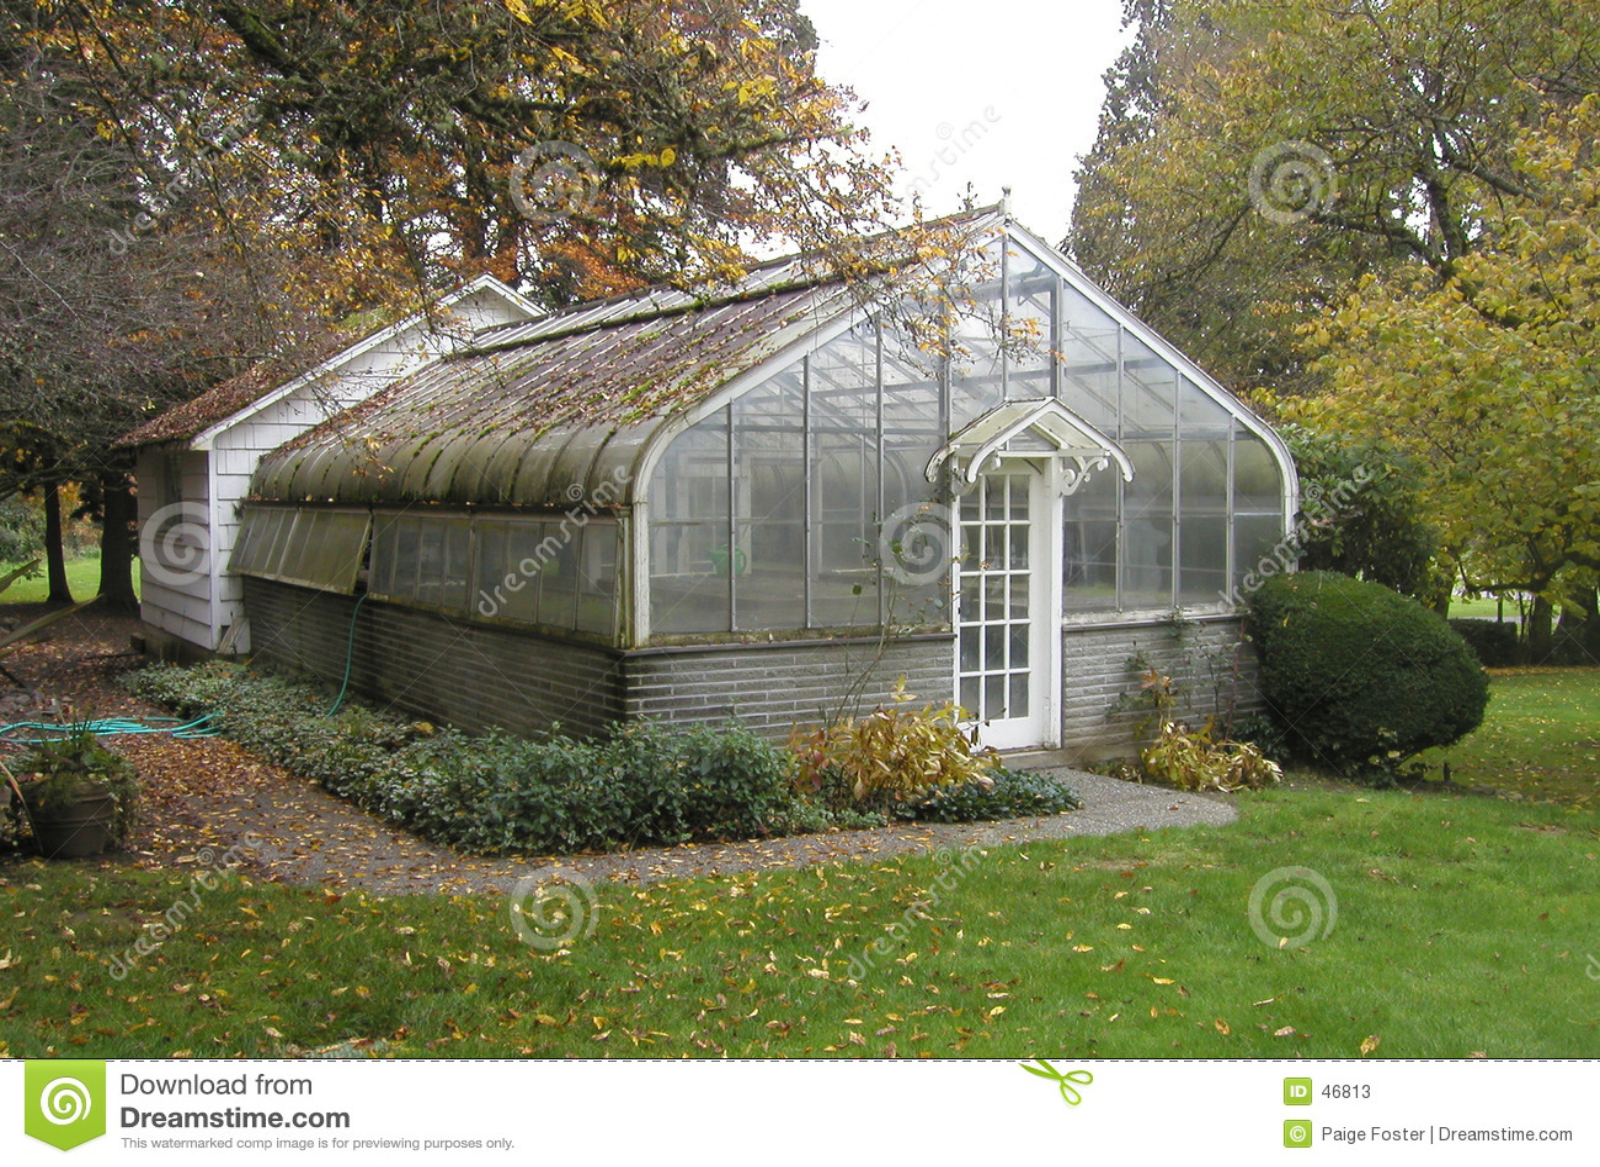 Download 温室老土气 库存图片. 图片 包括有 视窗, 自治权, 秋天, 叶子, 结构树, 温室, 布琼布拉, 环境美化 - 46813